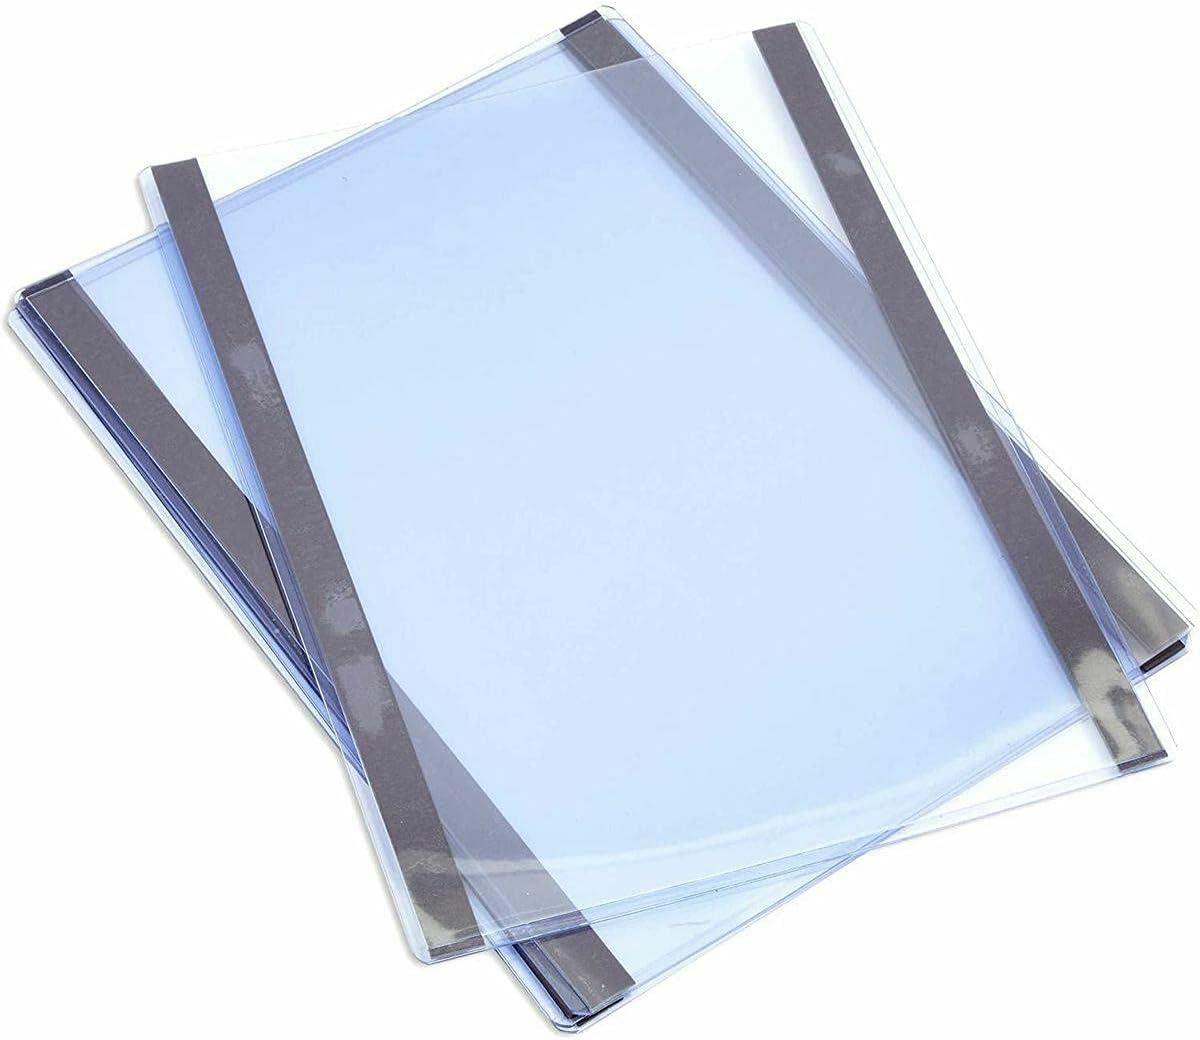 Vertical Magnetic Frames 8.9 x Washington Mall 11.5 Home 5 in improvemen Pack Cheap sale